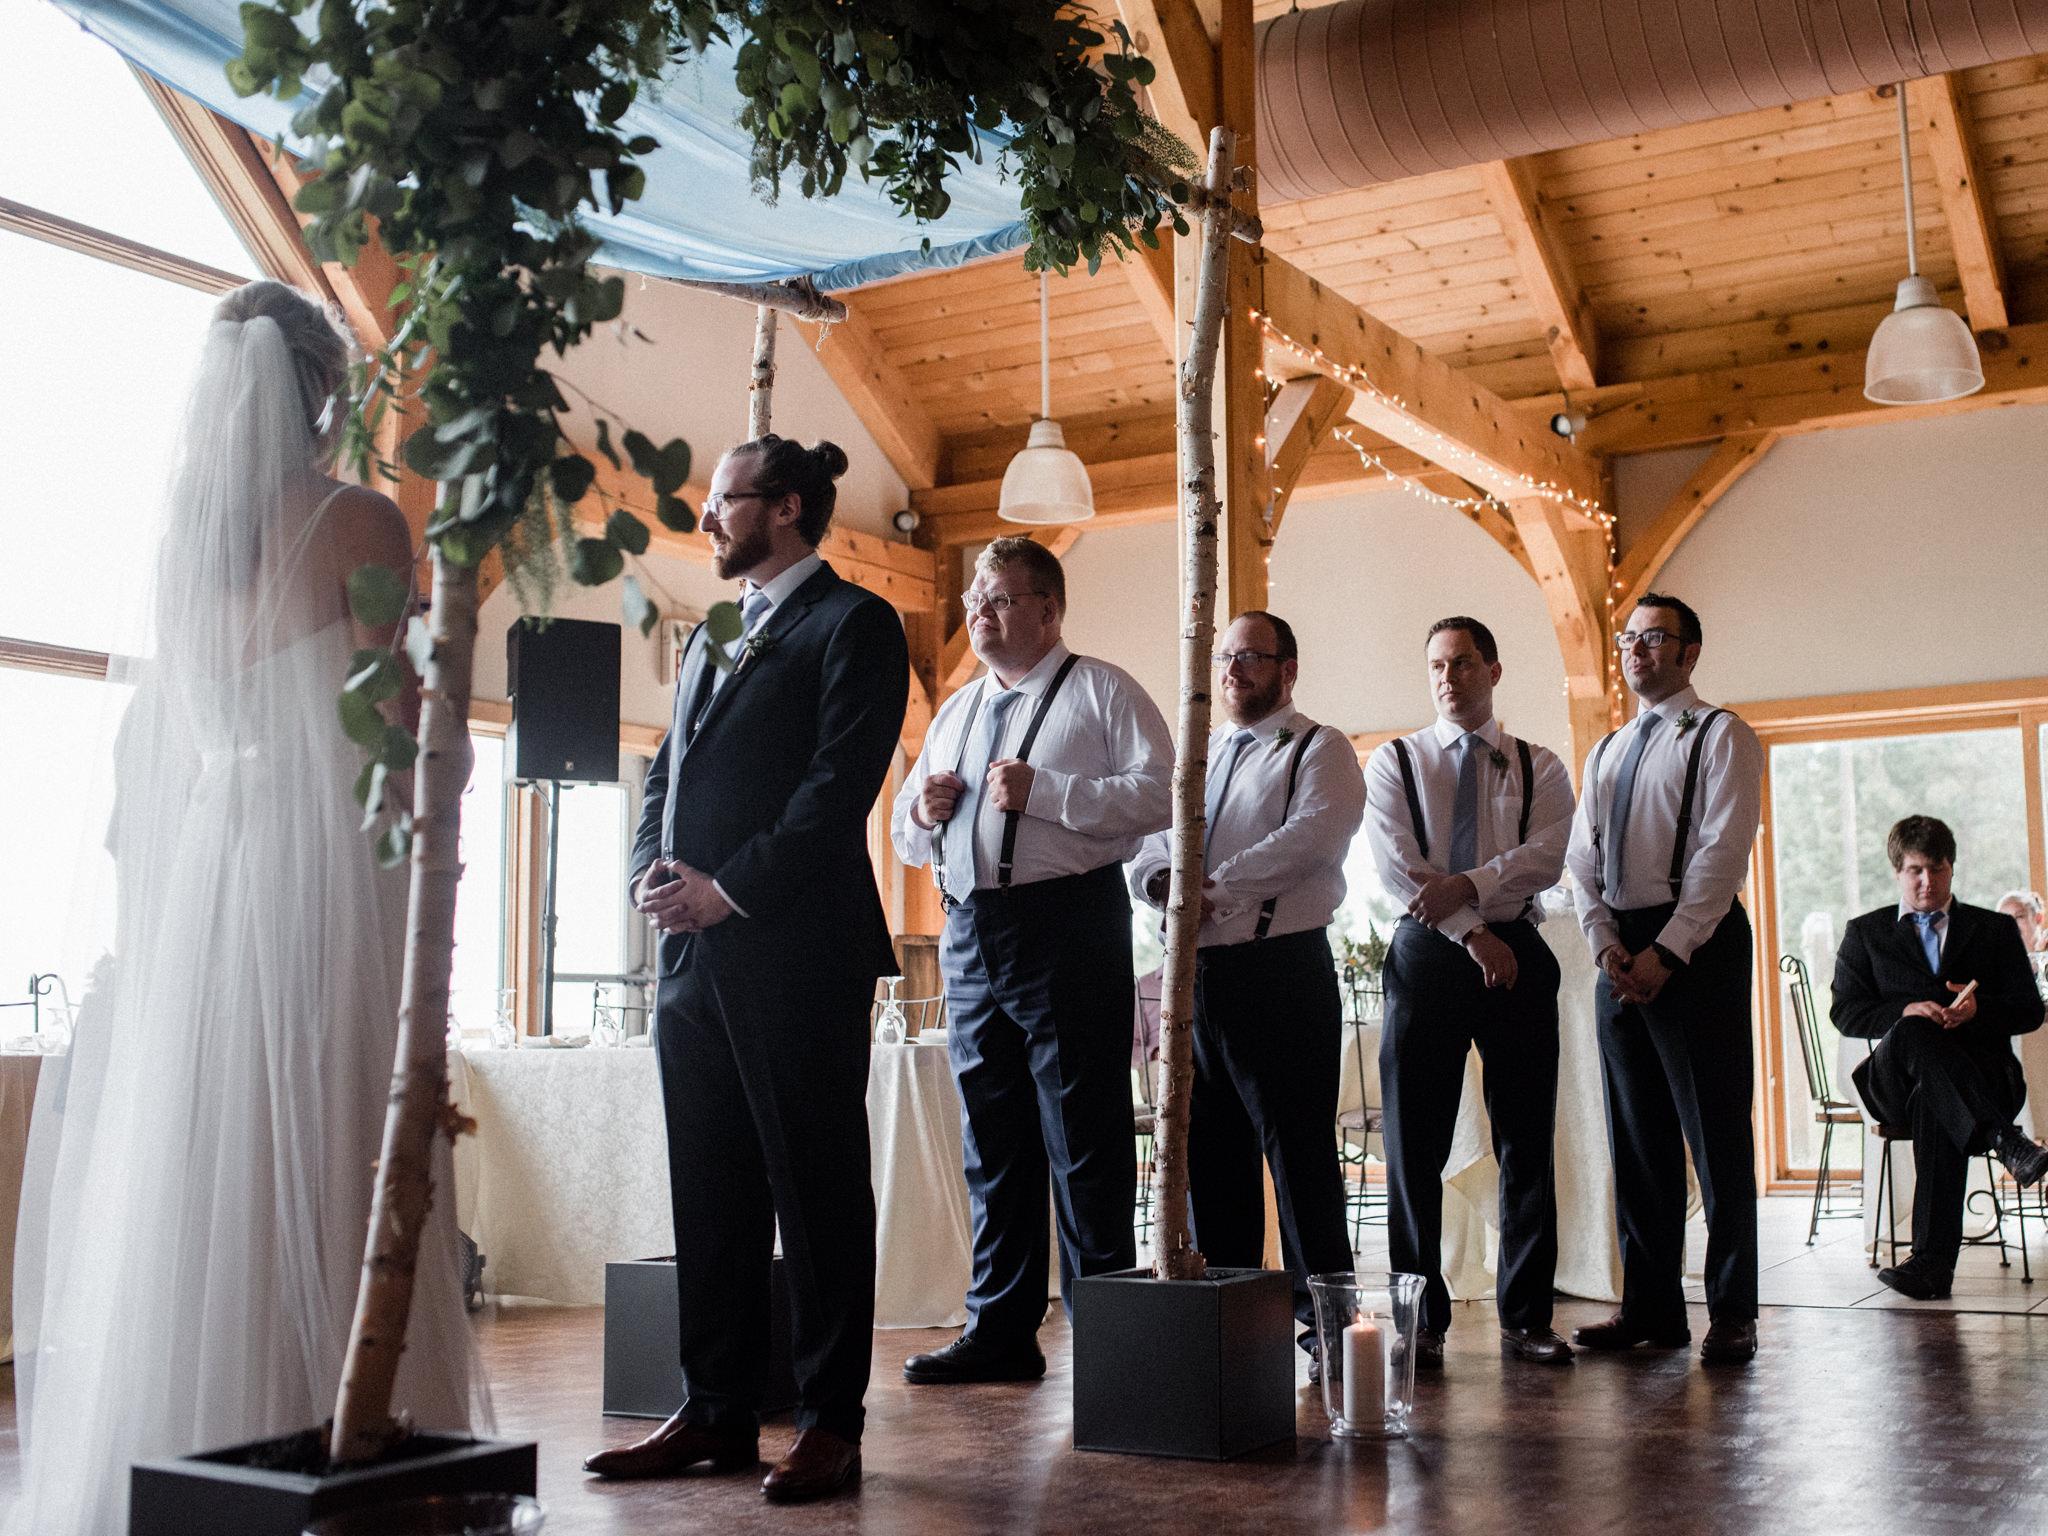 skyloft-wedding-toronto-wedding-photographer-34.jpg